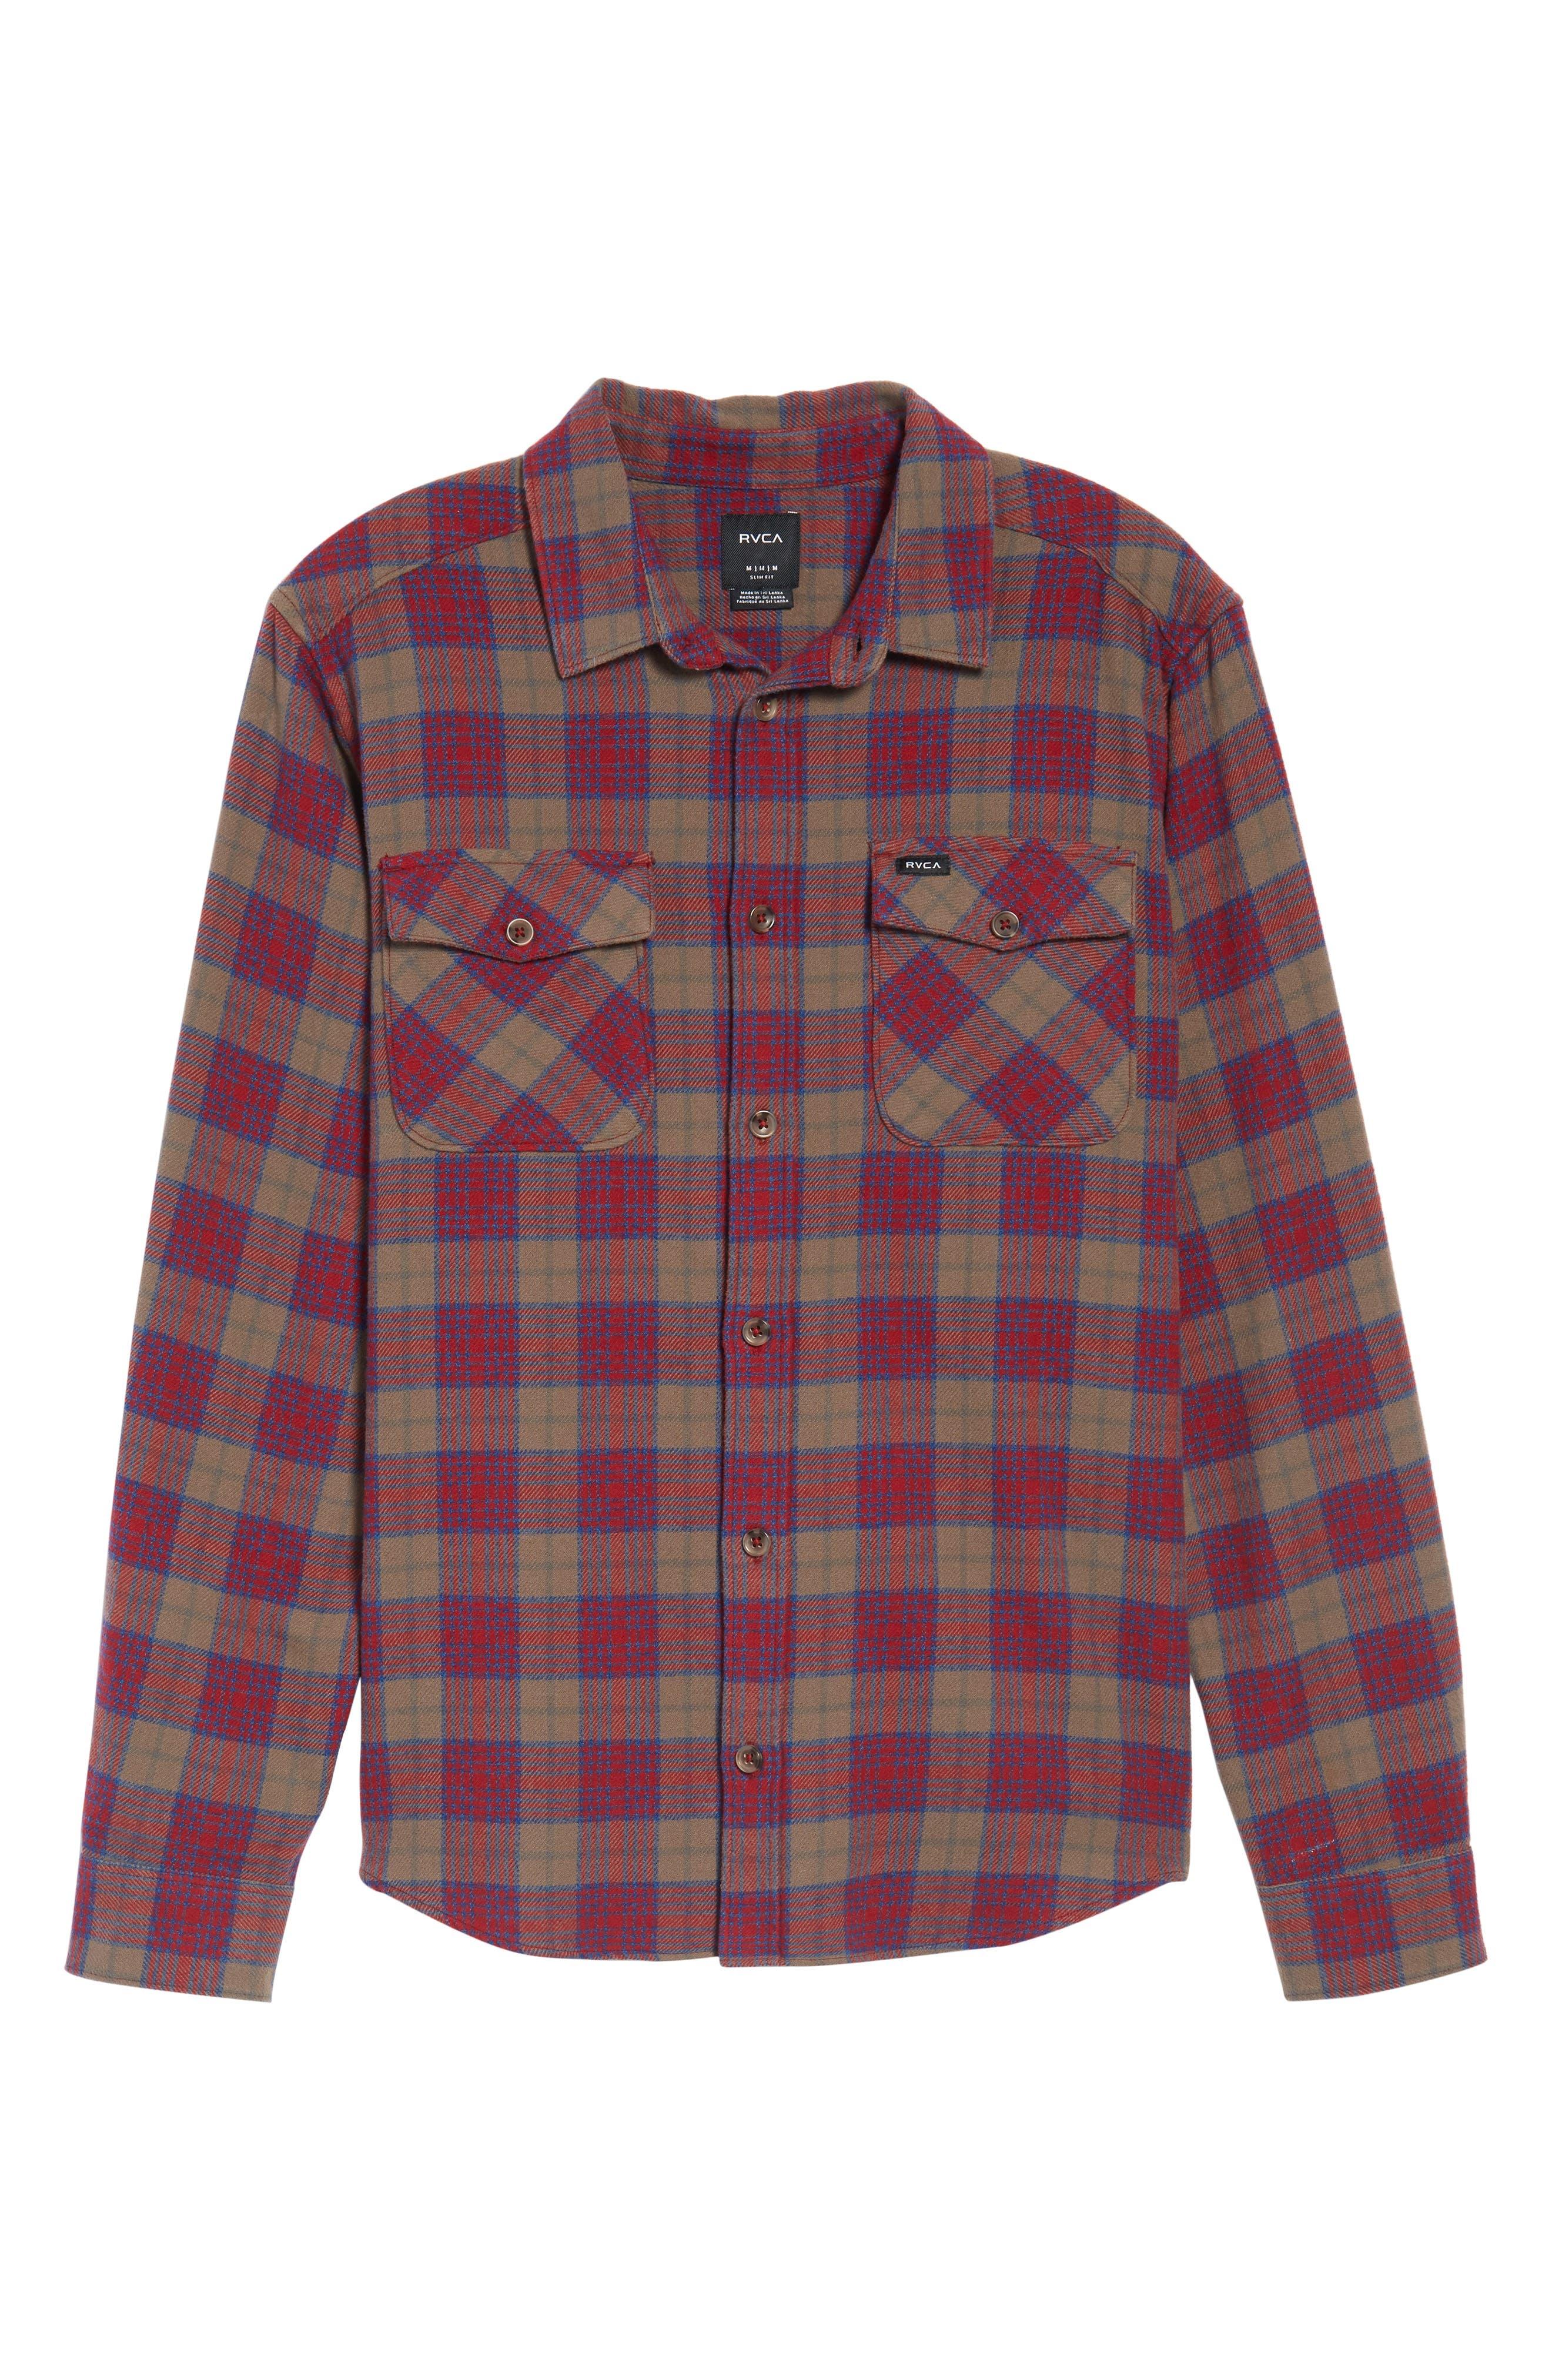 'That'll Work' Trim Fit Plaid Flannel Shirt,                             Alternate thumbnail 29, color,